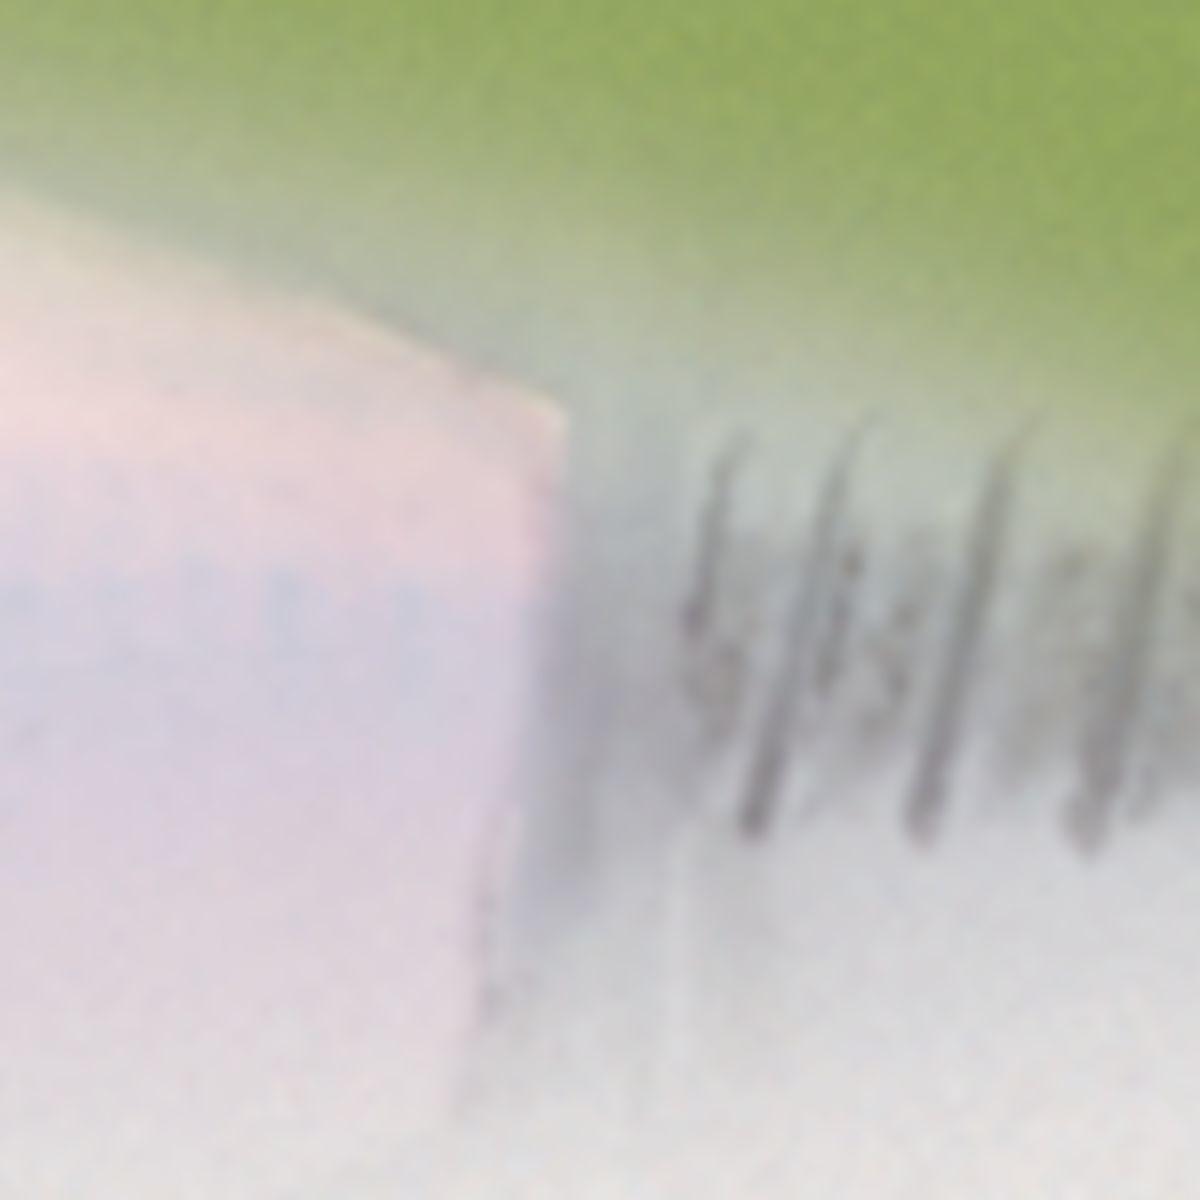 MirrOlure® MirrOdine™ Luminescence Series 27MR